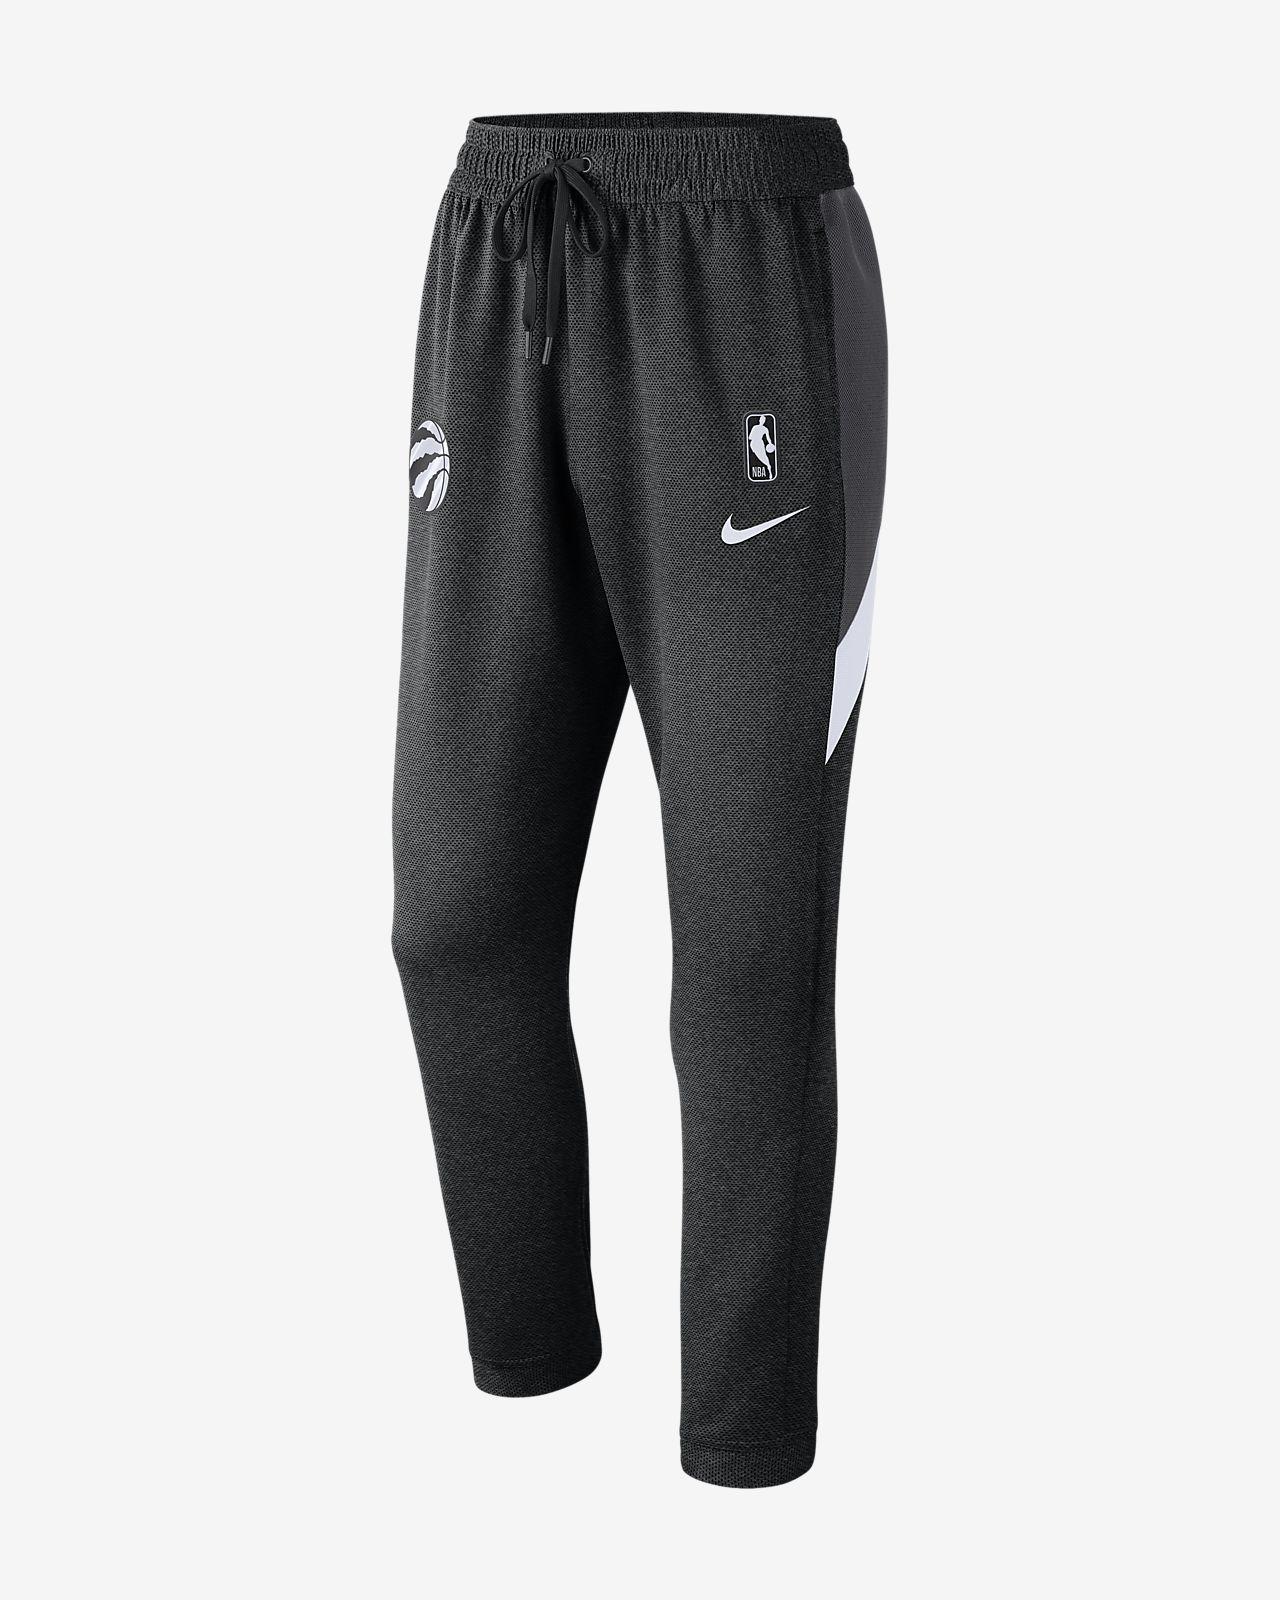 Toronto Raptors Nike Therma Flex Showtime Men's NBA Trousers